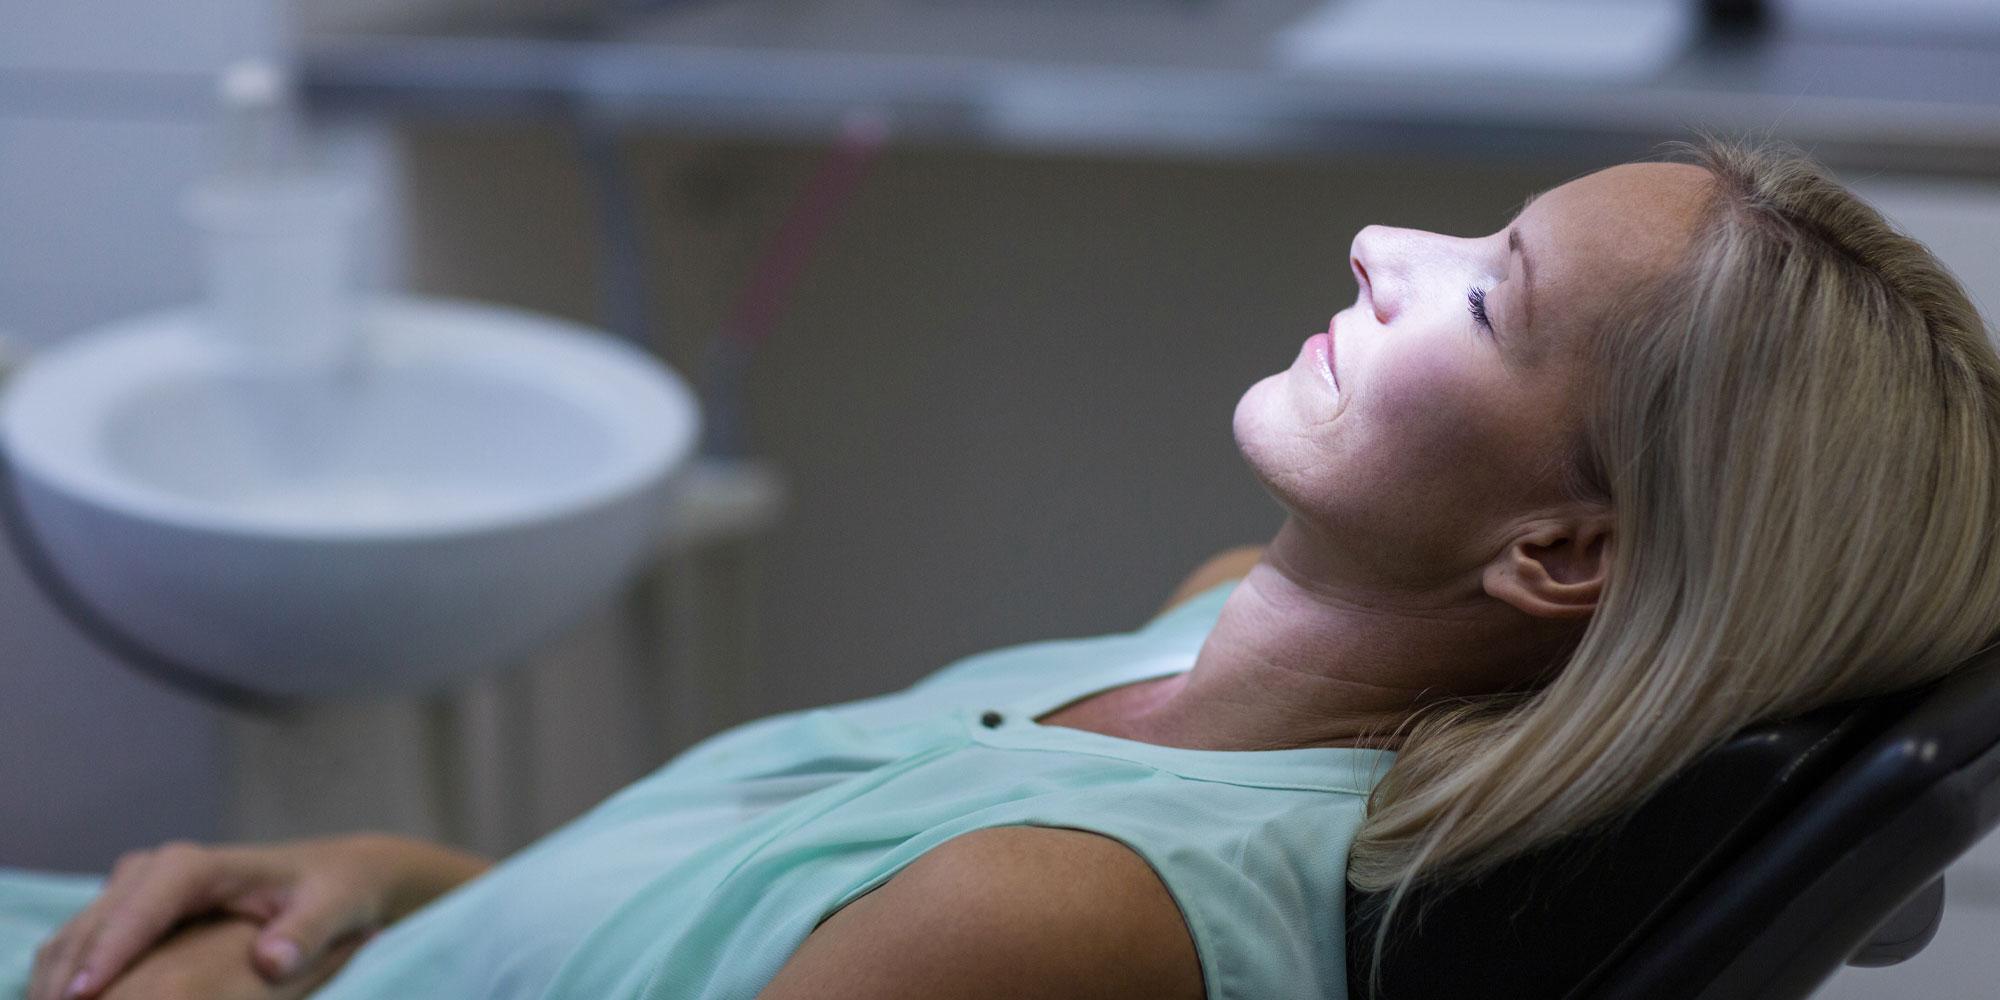 Sedation patient